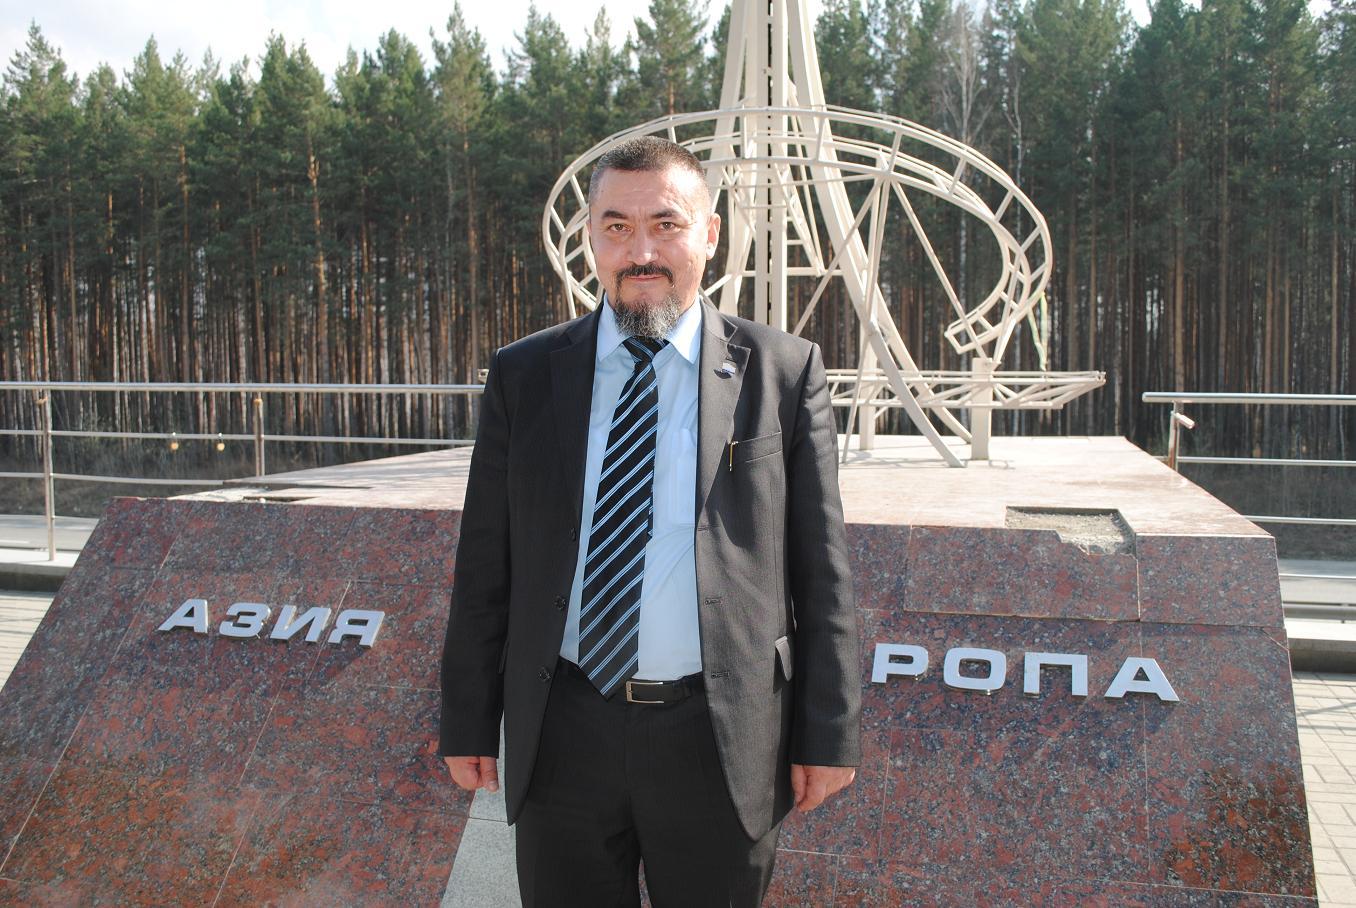 Ekaterinburg_Eltsin_readings_2012_04_25_28_Asia-Europe_Sobianin_Alexander_sm